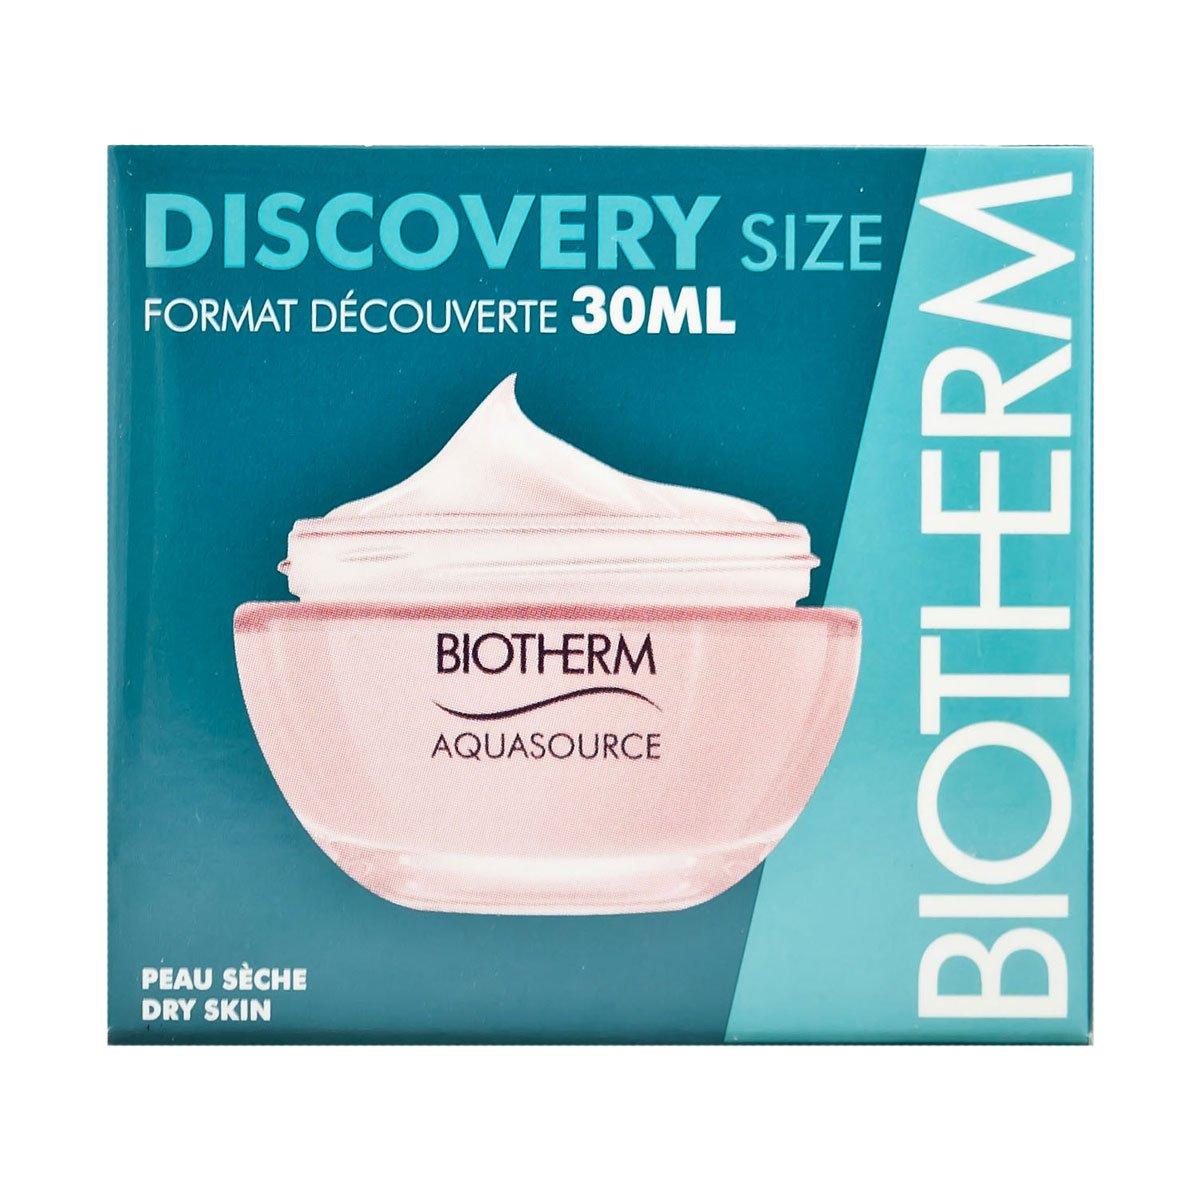 Aquasource 48H Deep Hydration Replenishing Cream (Dry Skin)[並行輸入品] B00UNGTMIW